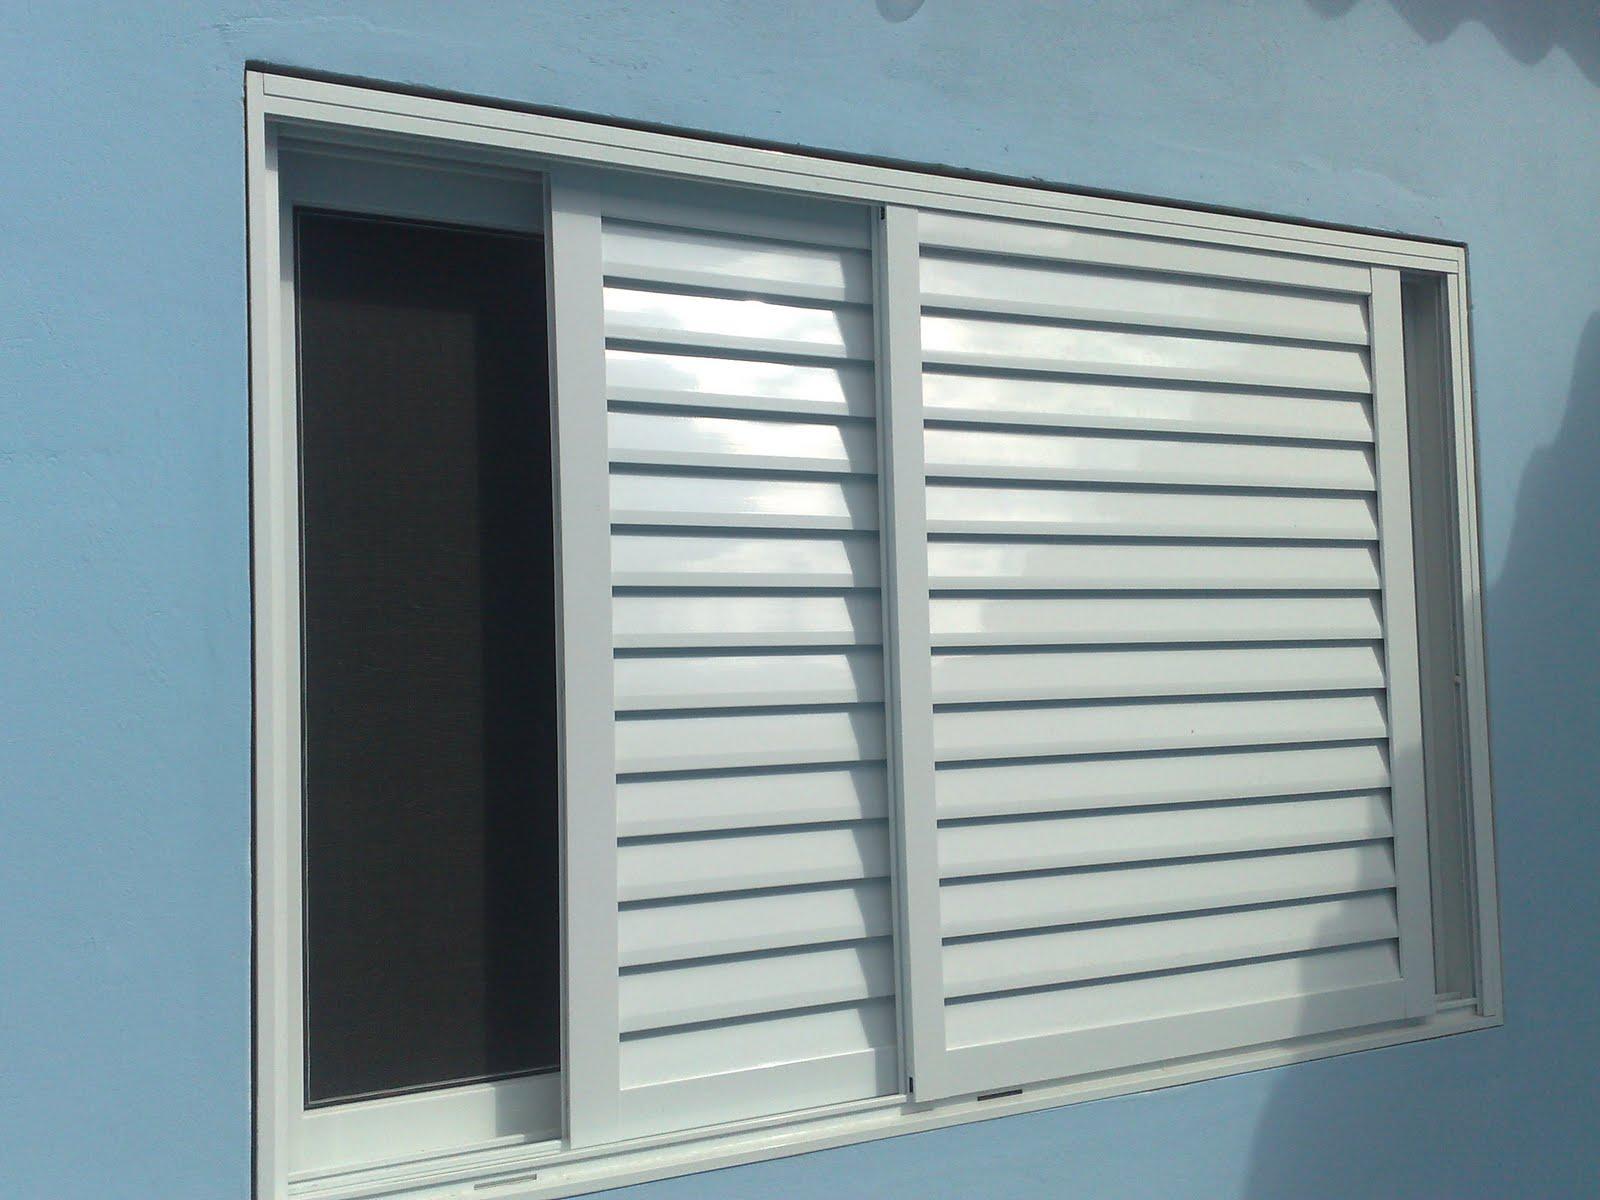 #4B6F80 RS Renato Serralheria: janelas e basculantes de aluminio 928 Onde Comprar Porta E Janela De Aluminio